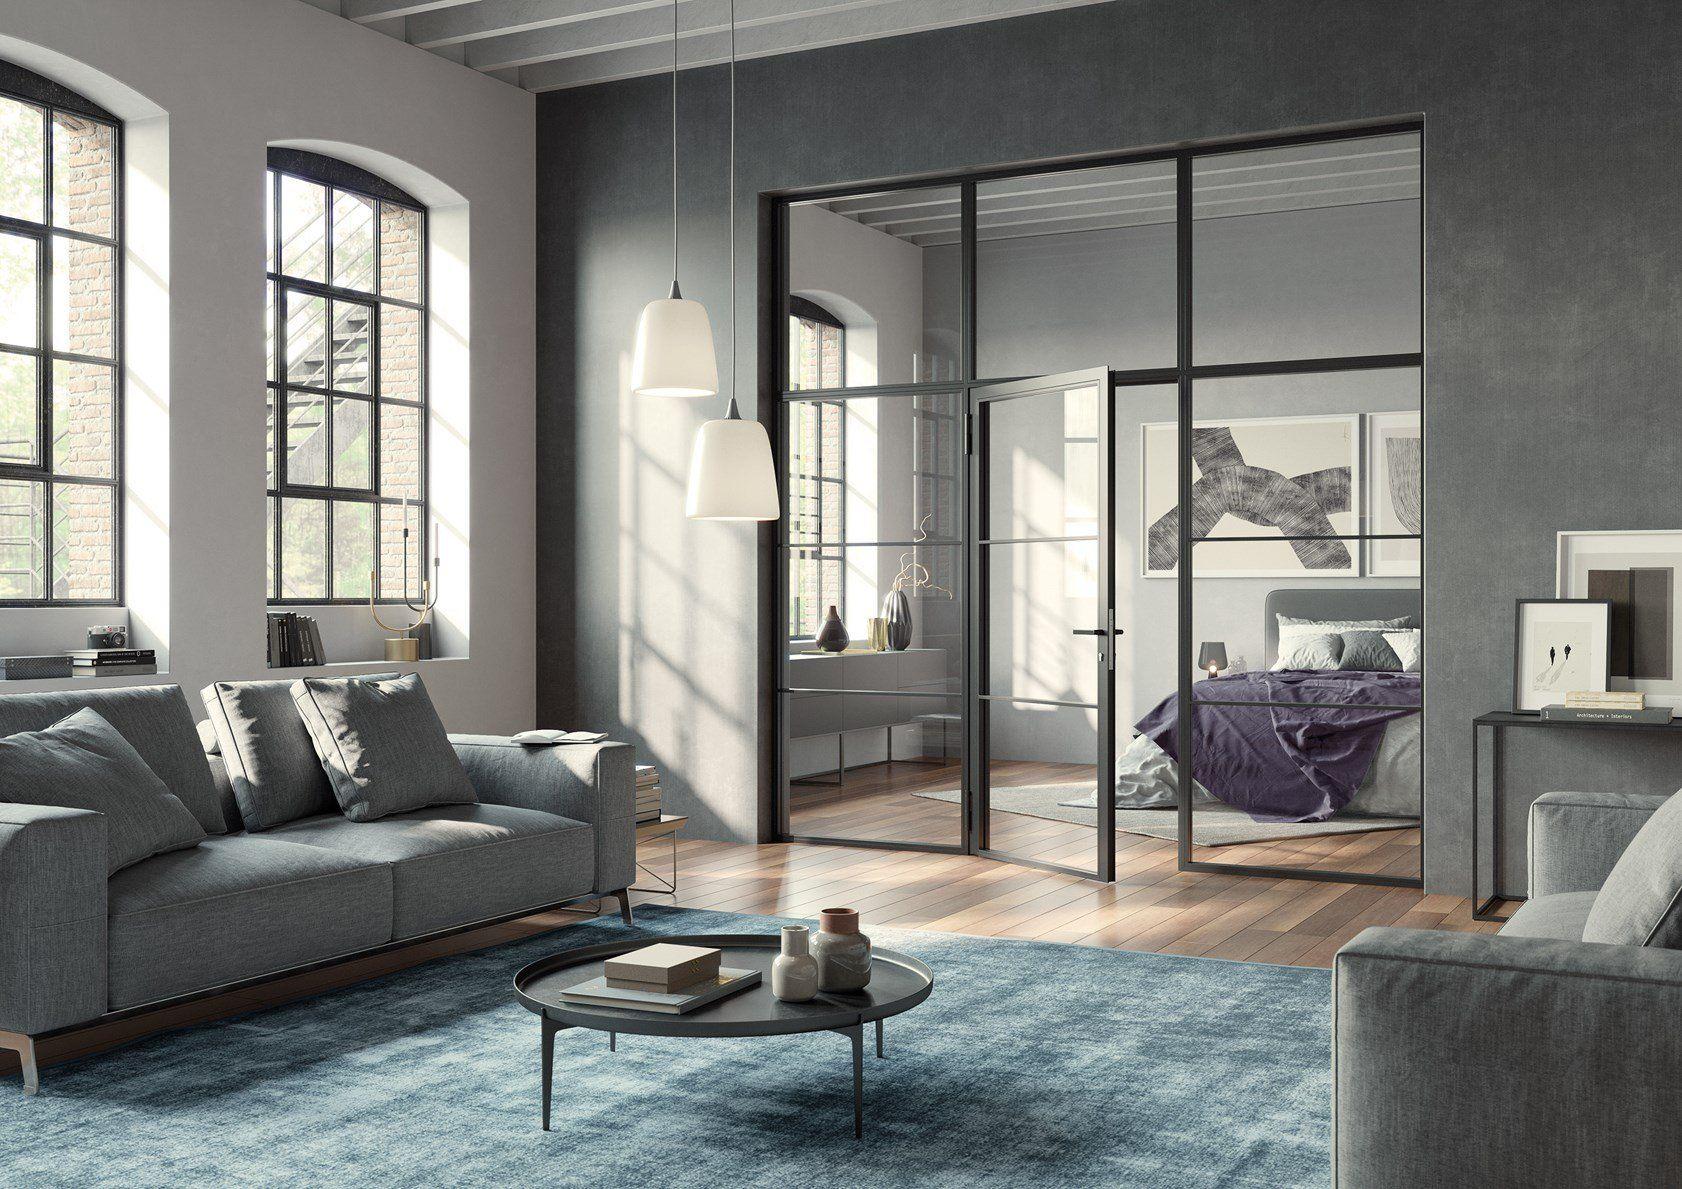 Nuove porte per loft LFT Hörmann: suggestive trasparenze dal mood industrial